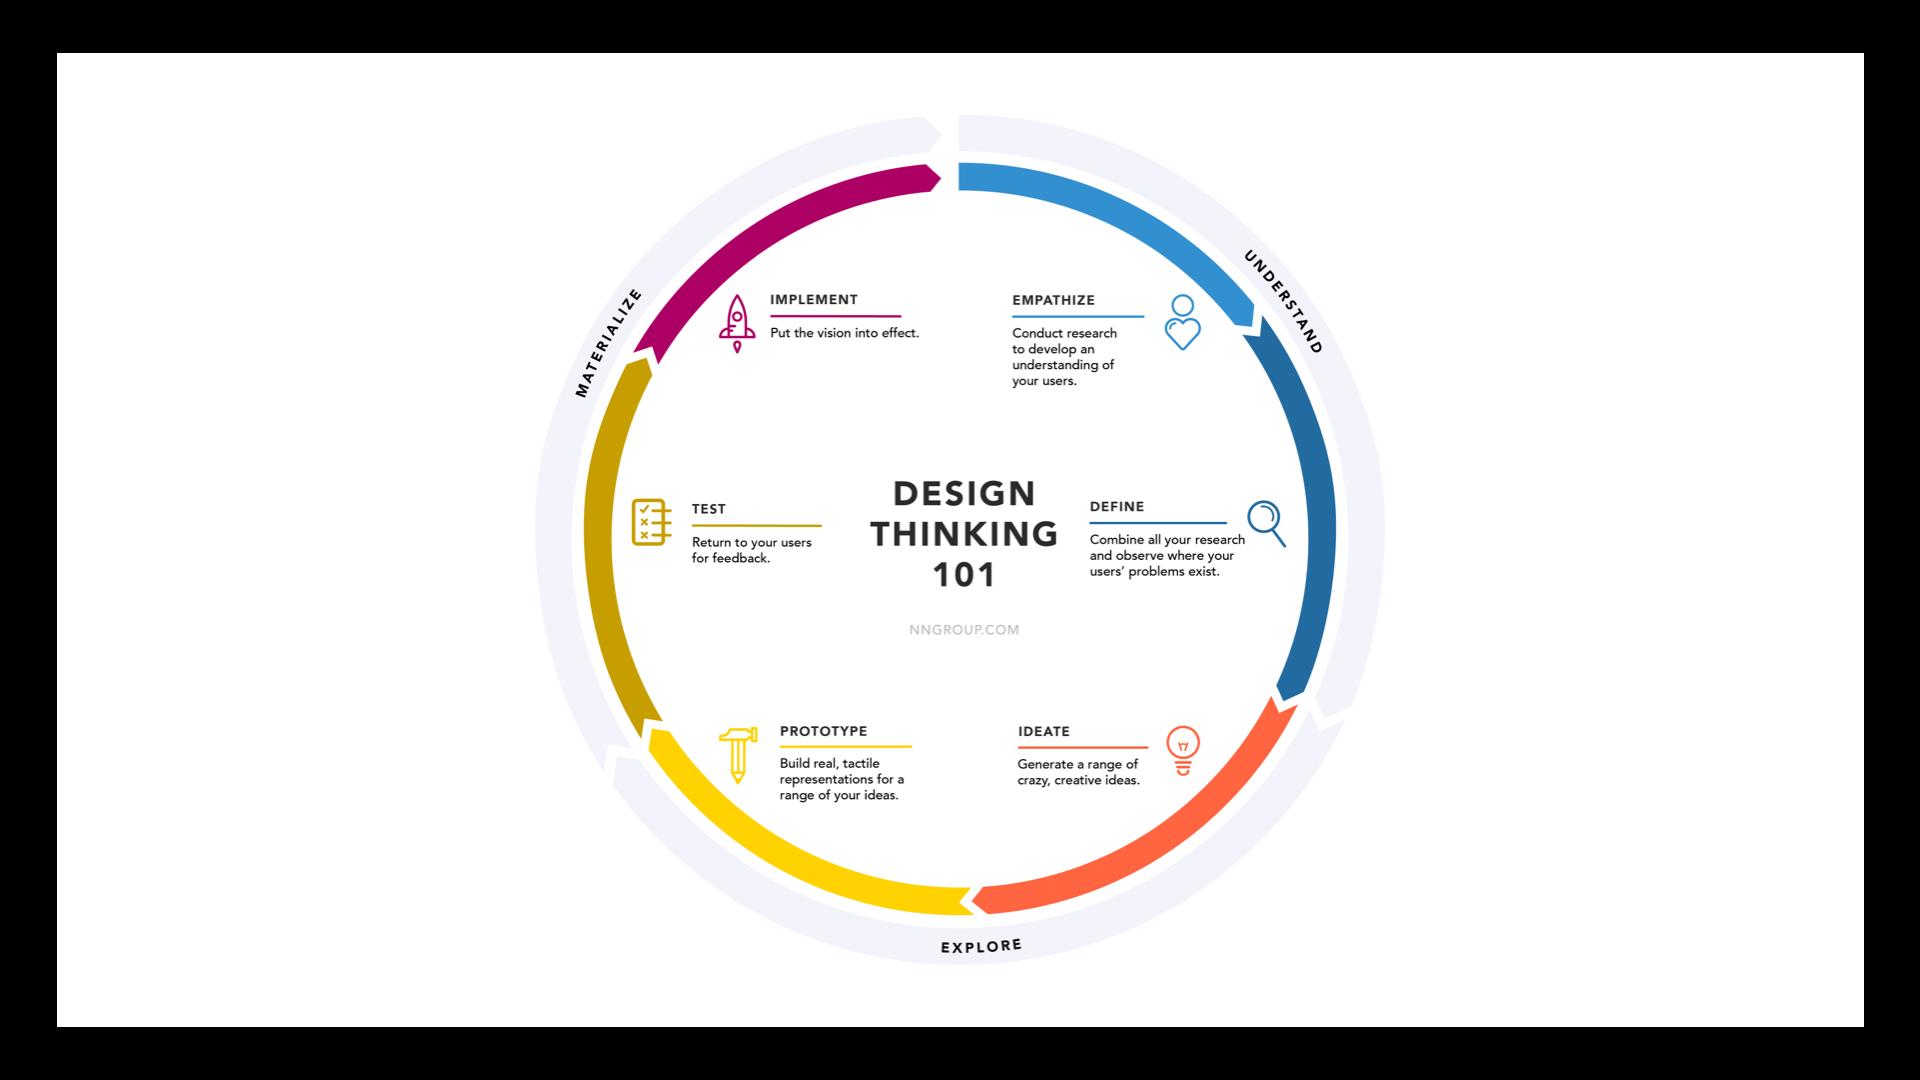 Nielsen Norman circular process chart - design thinking